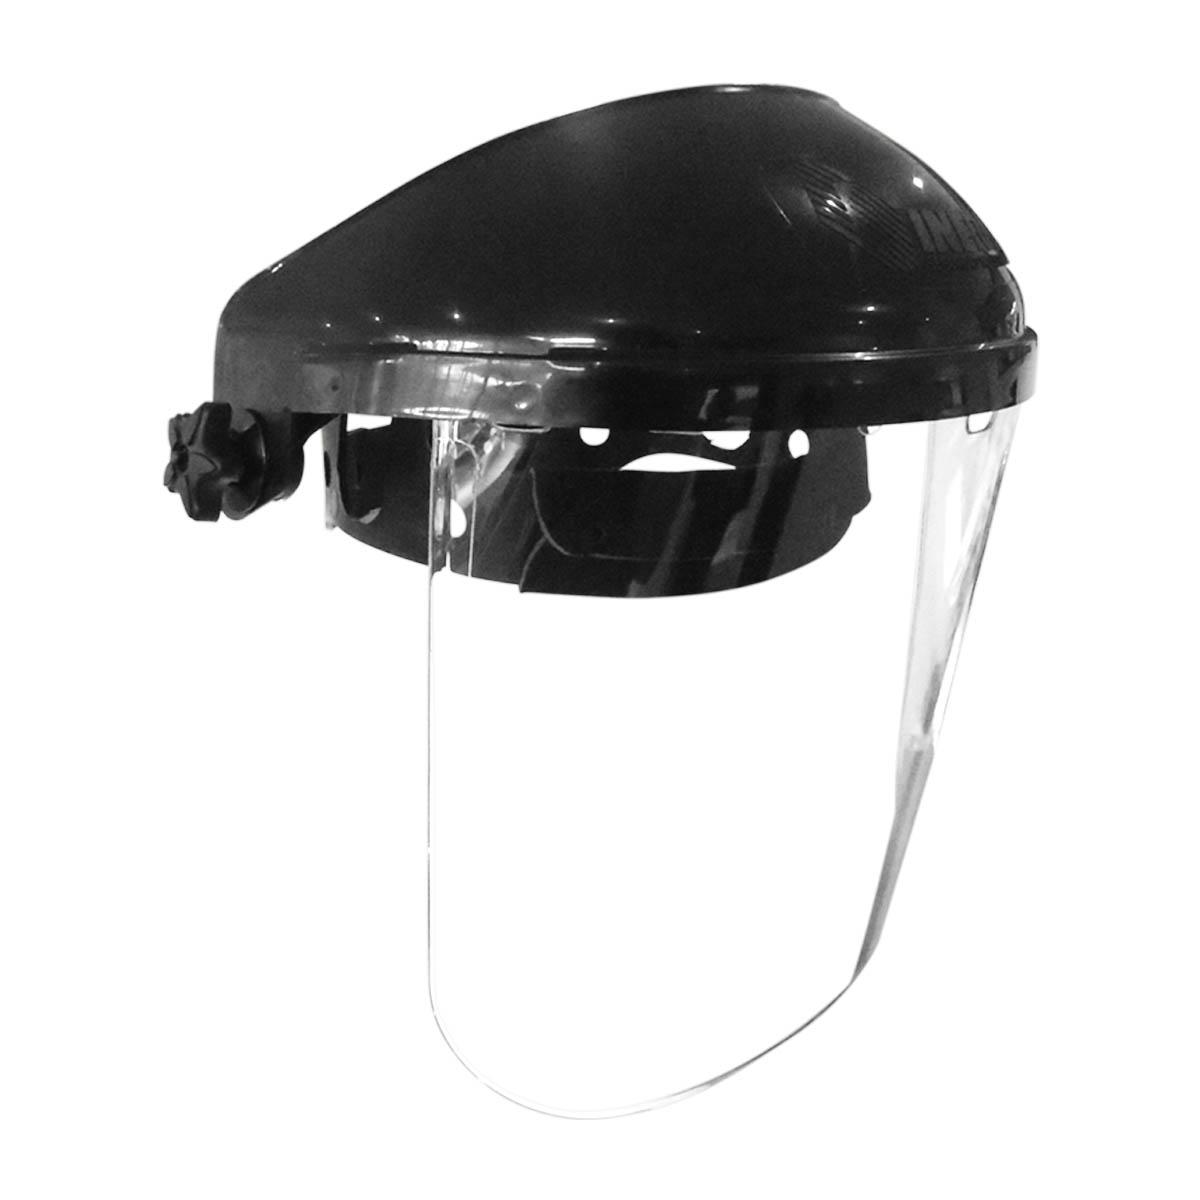 Protector Facial Visor 21 y 30 cm 3Pf-300T Infra